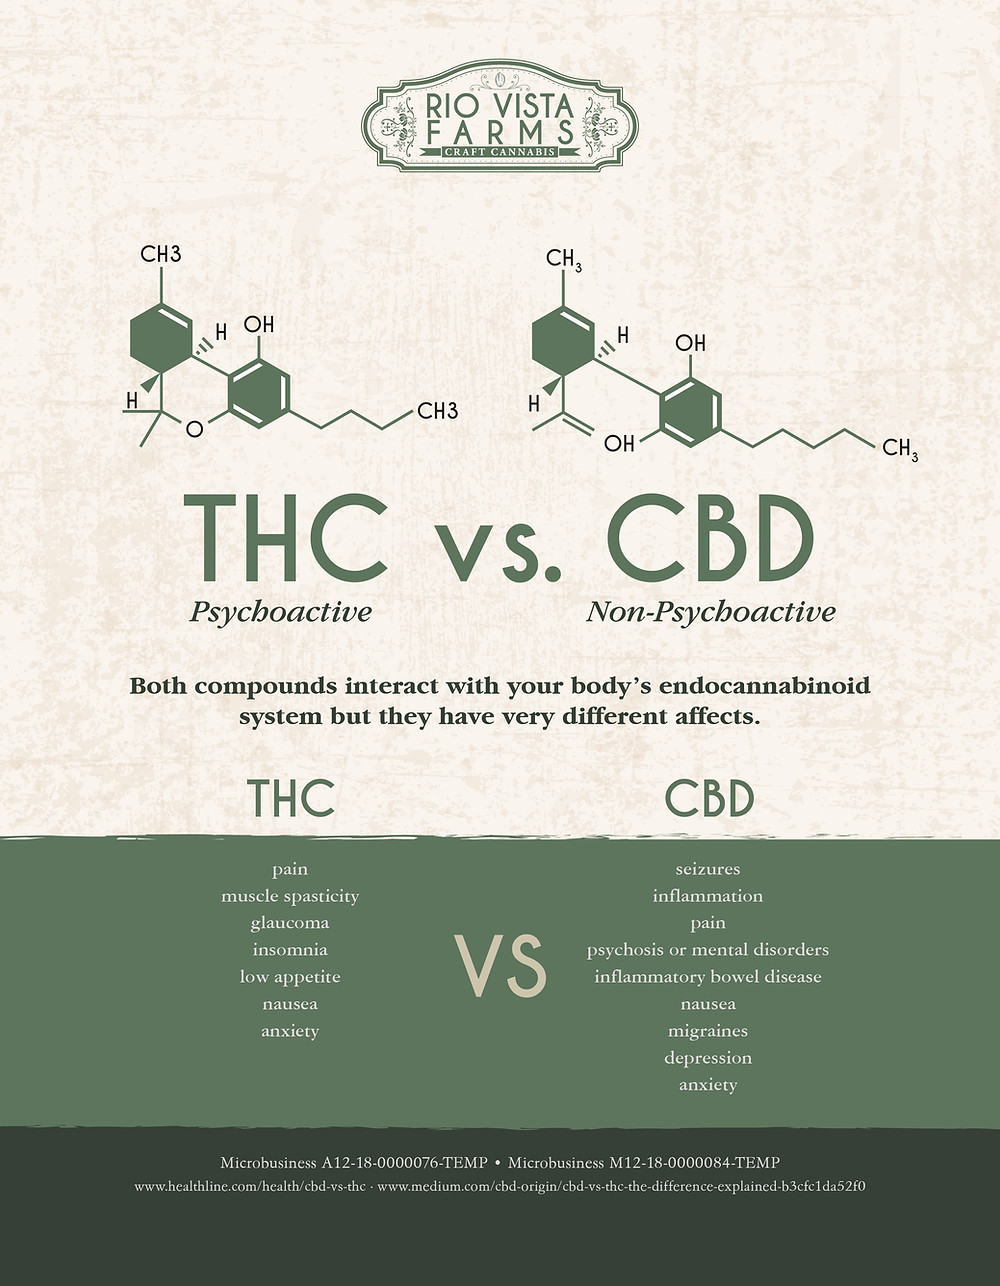 Rio Vista Farms THC vs CBD